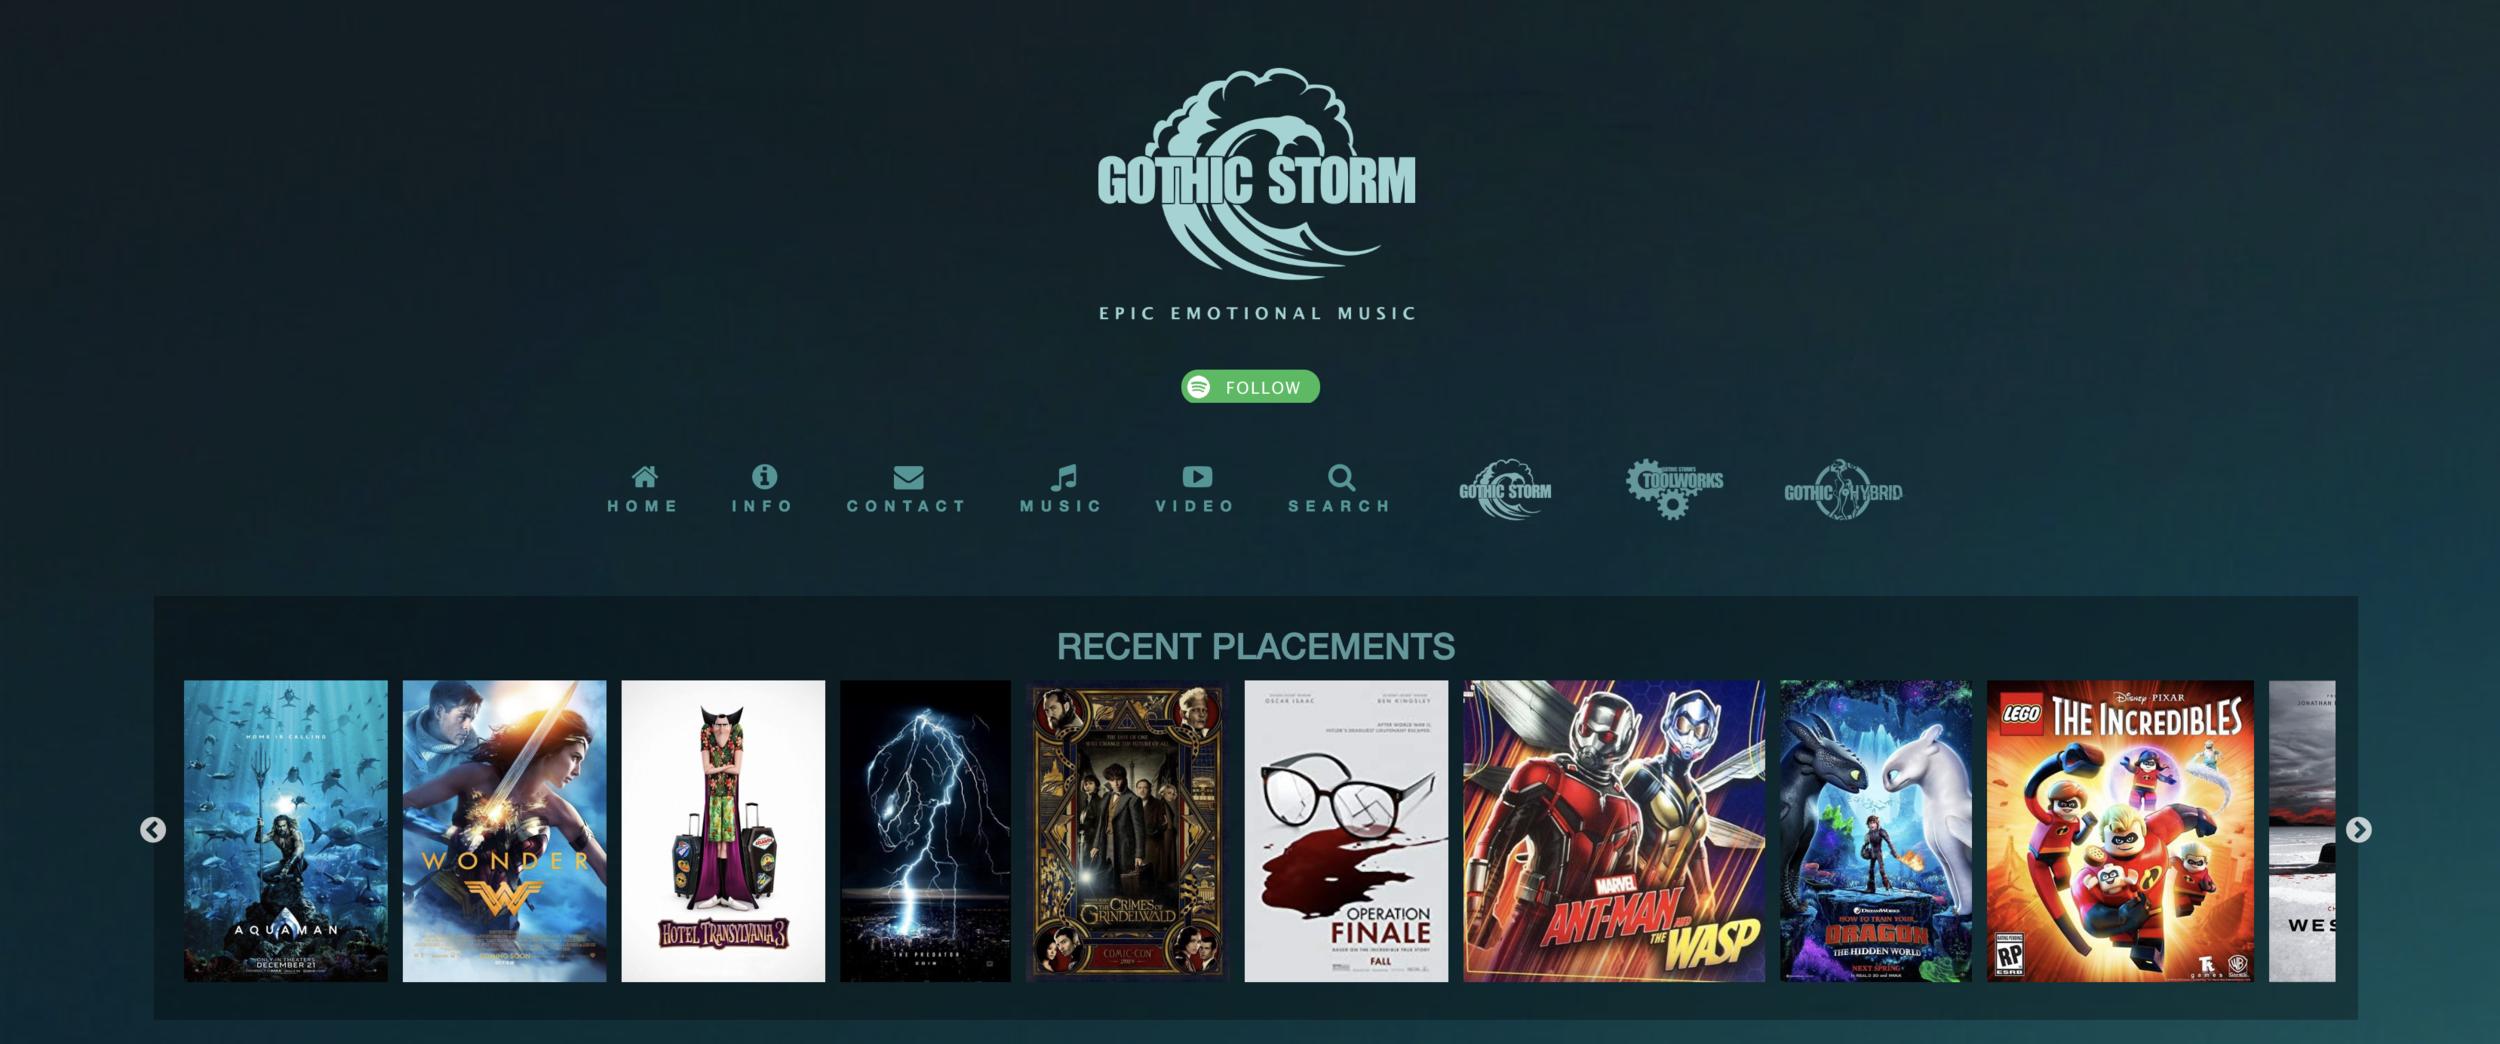 Gothic Storm's Website